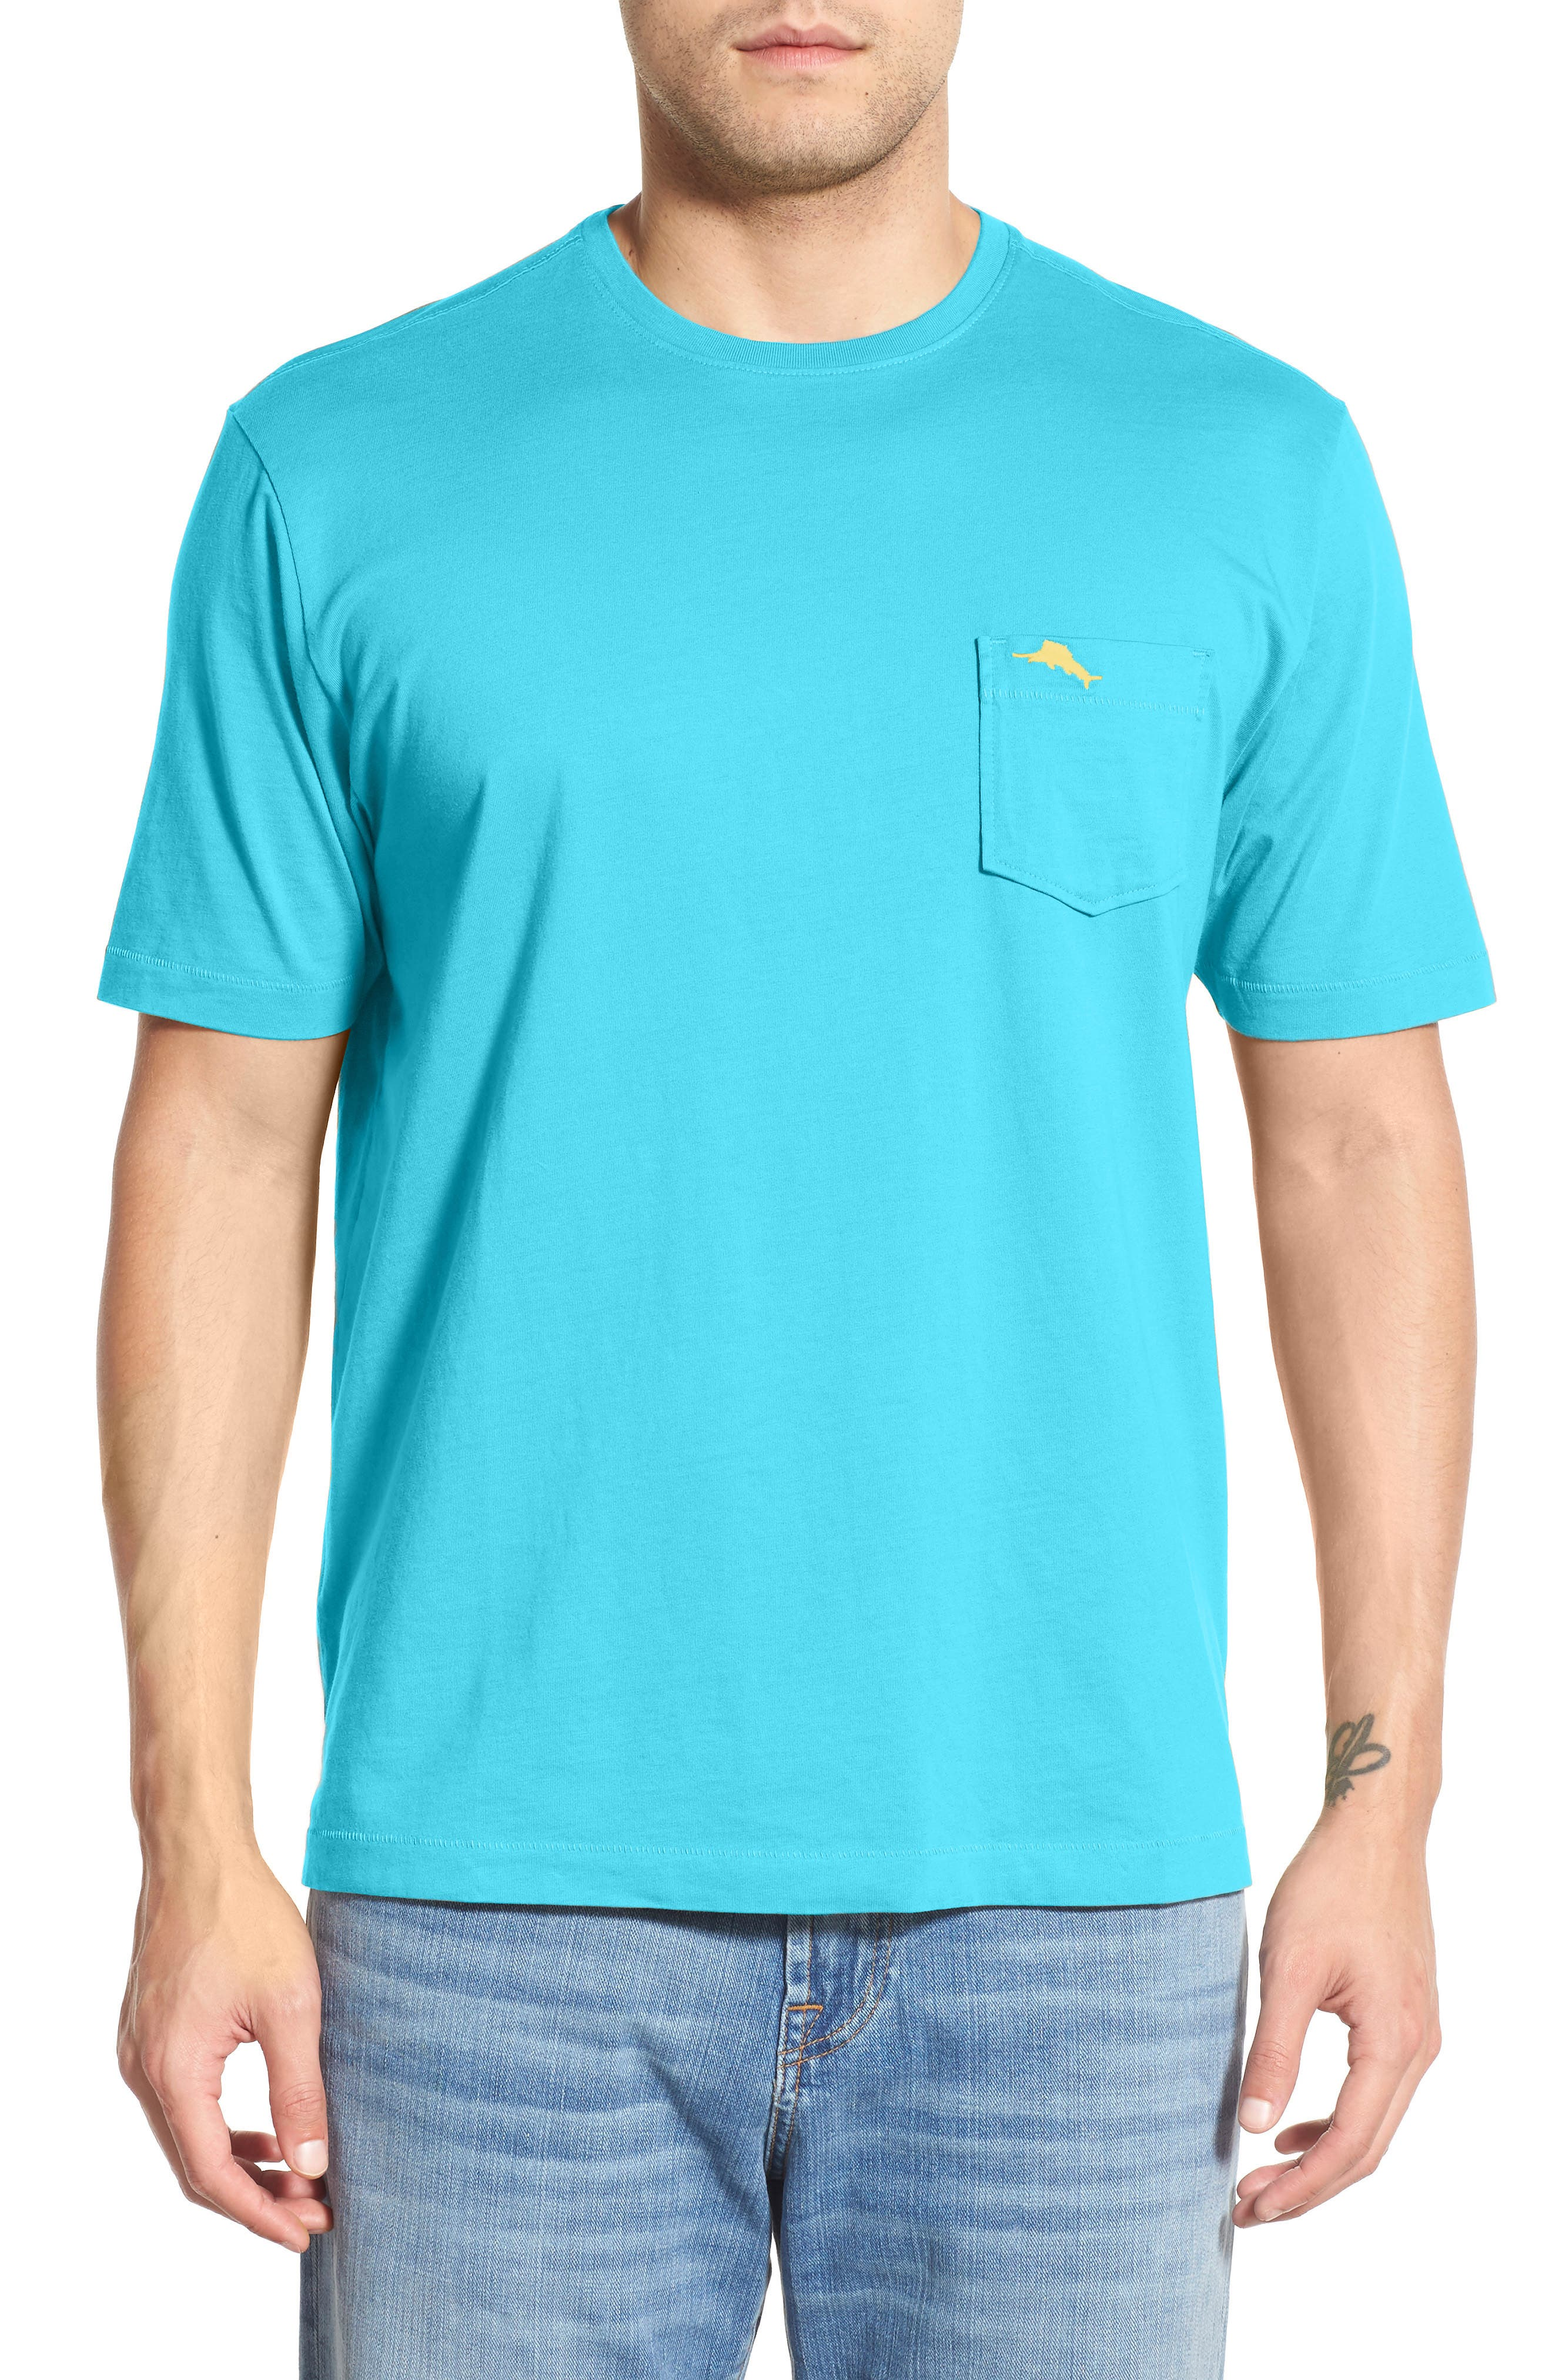 Bali Skyline T-Shirt,                             Main thumbnail 1, color,                             Aqua Mist